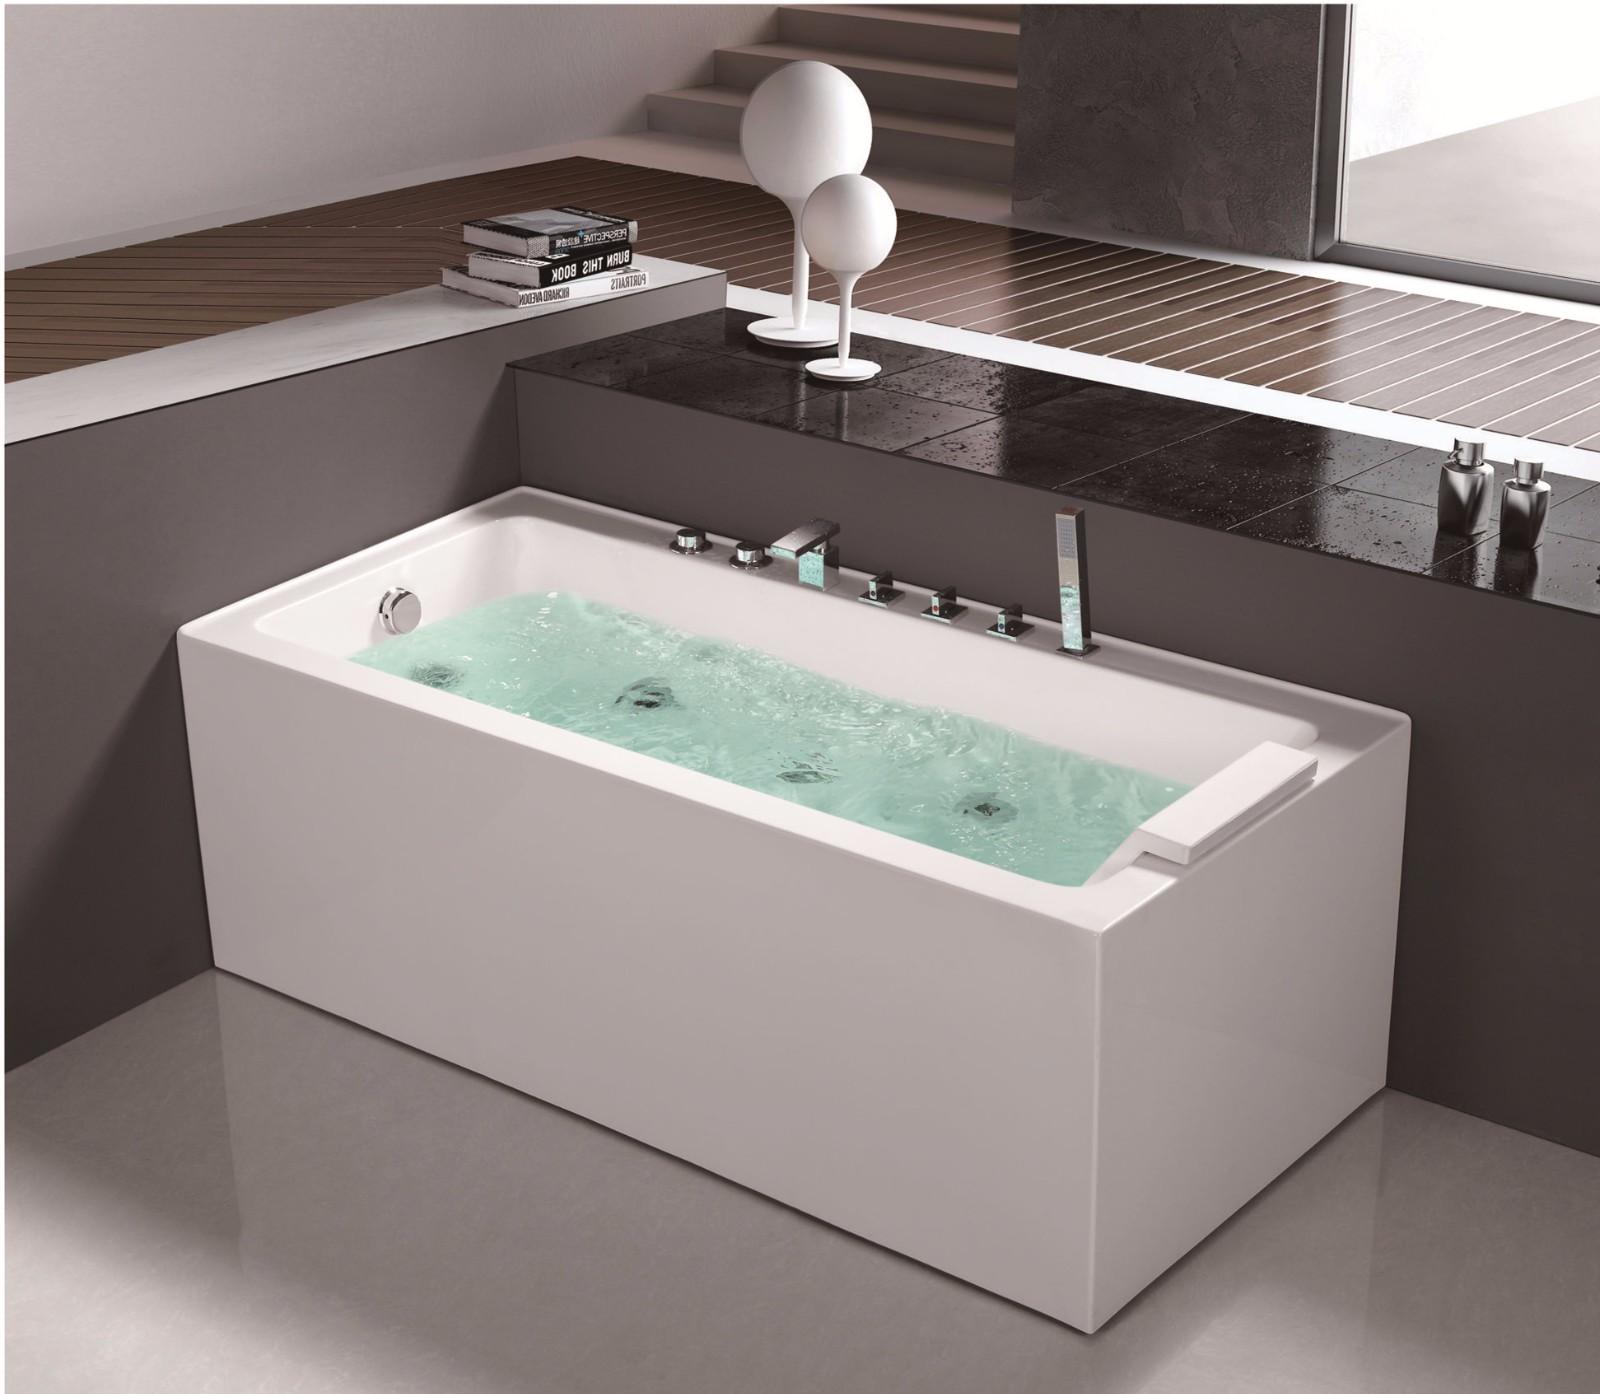 China Simple Modern Design Style Hot Corner Whirlpool